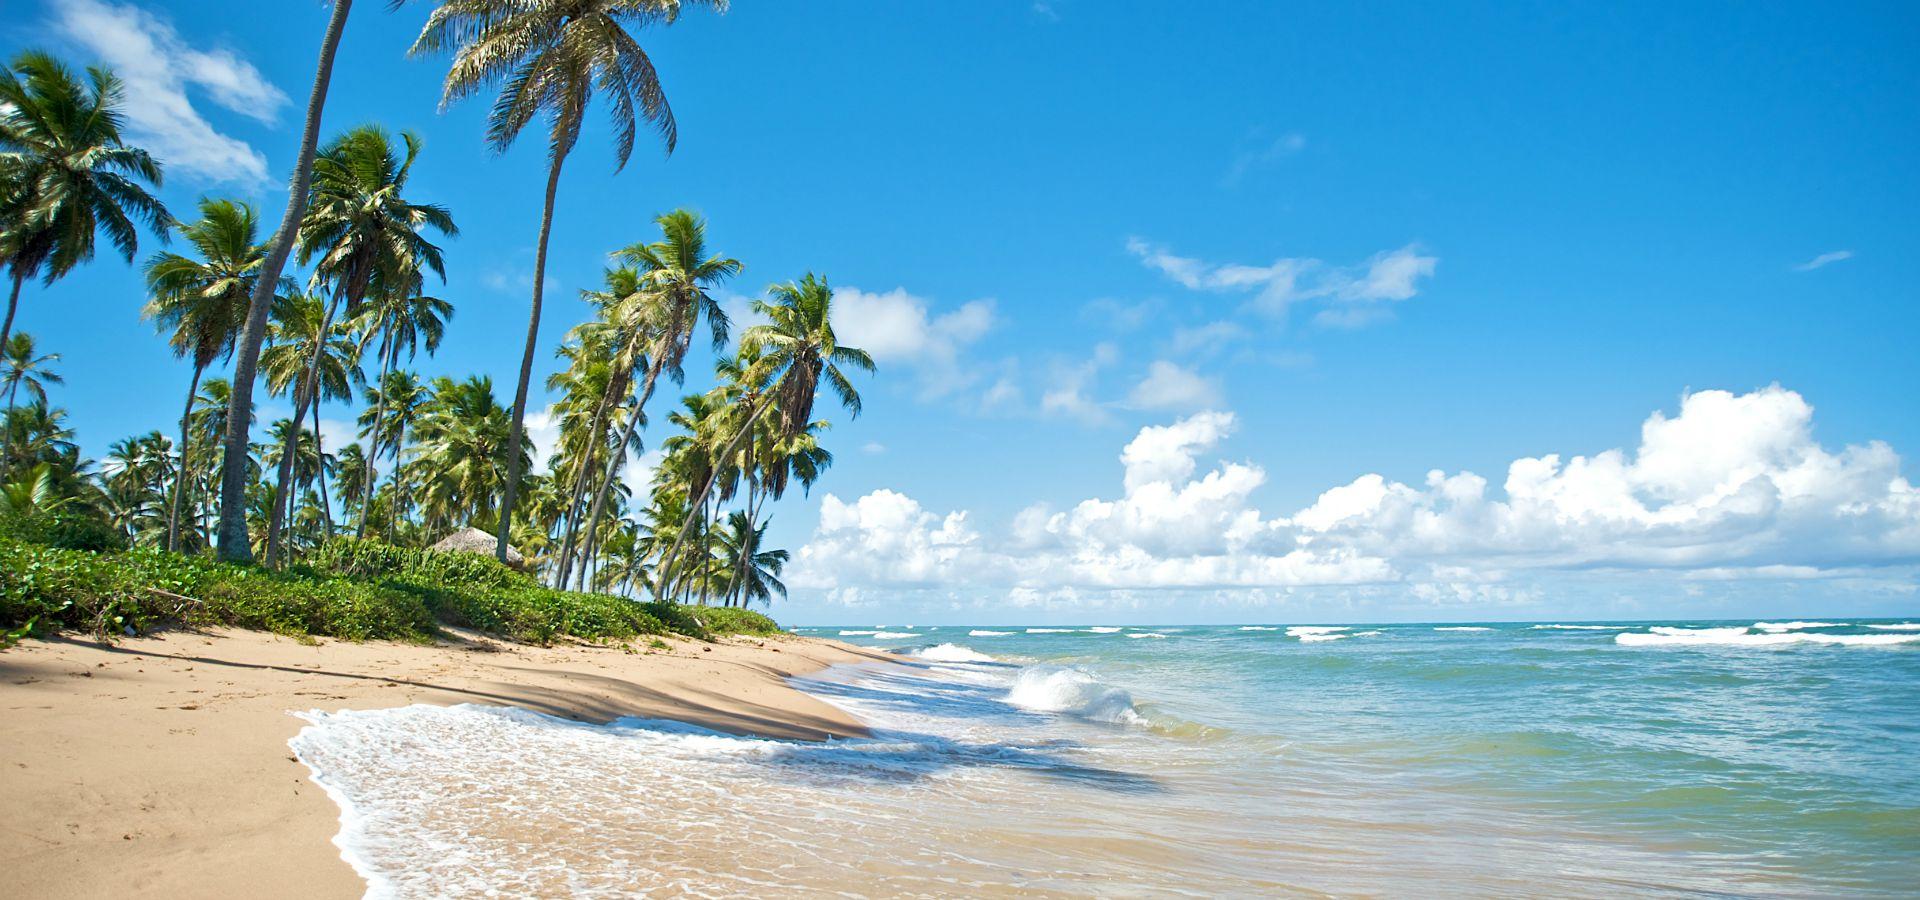 Brazilian beaches pics 93